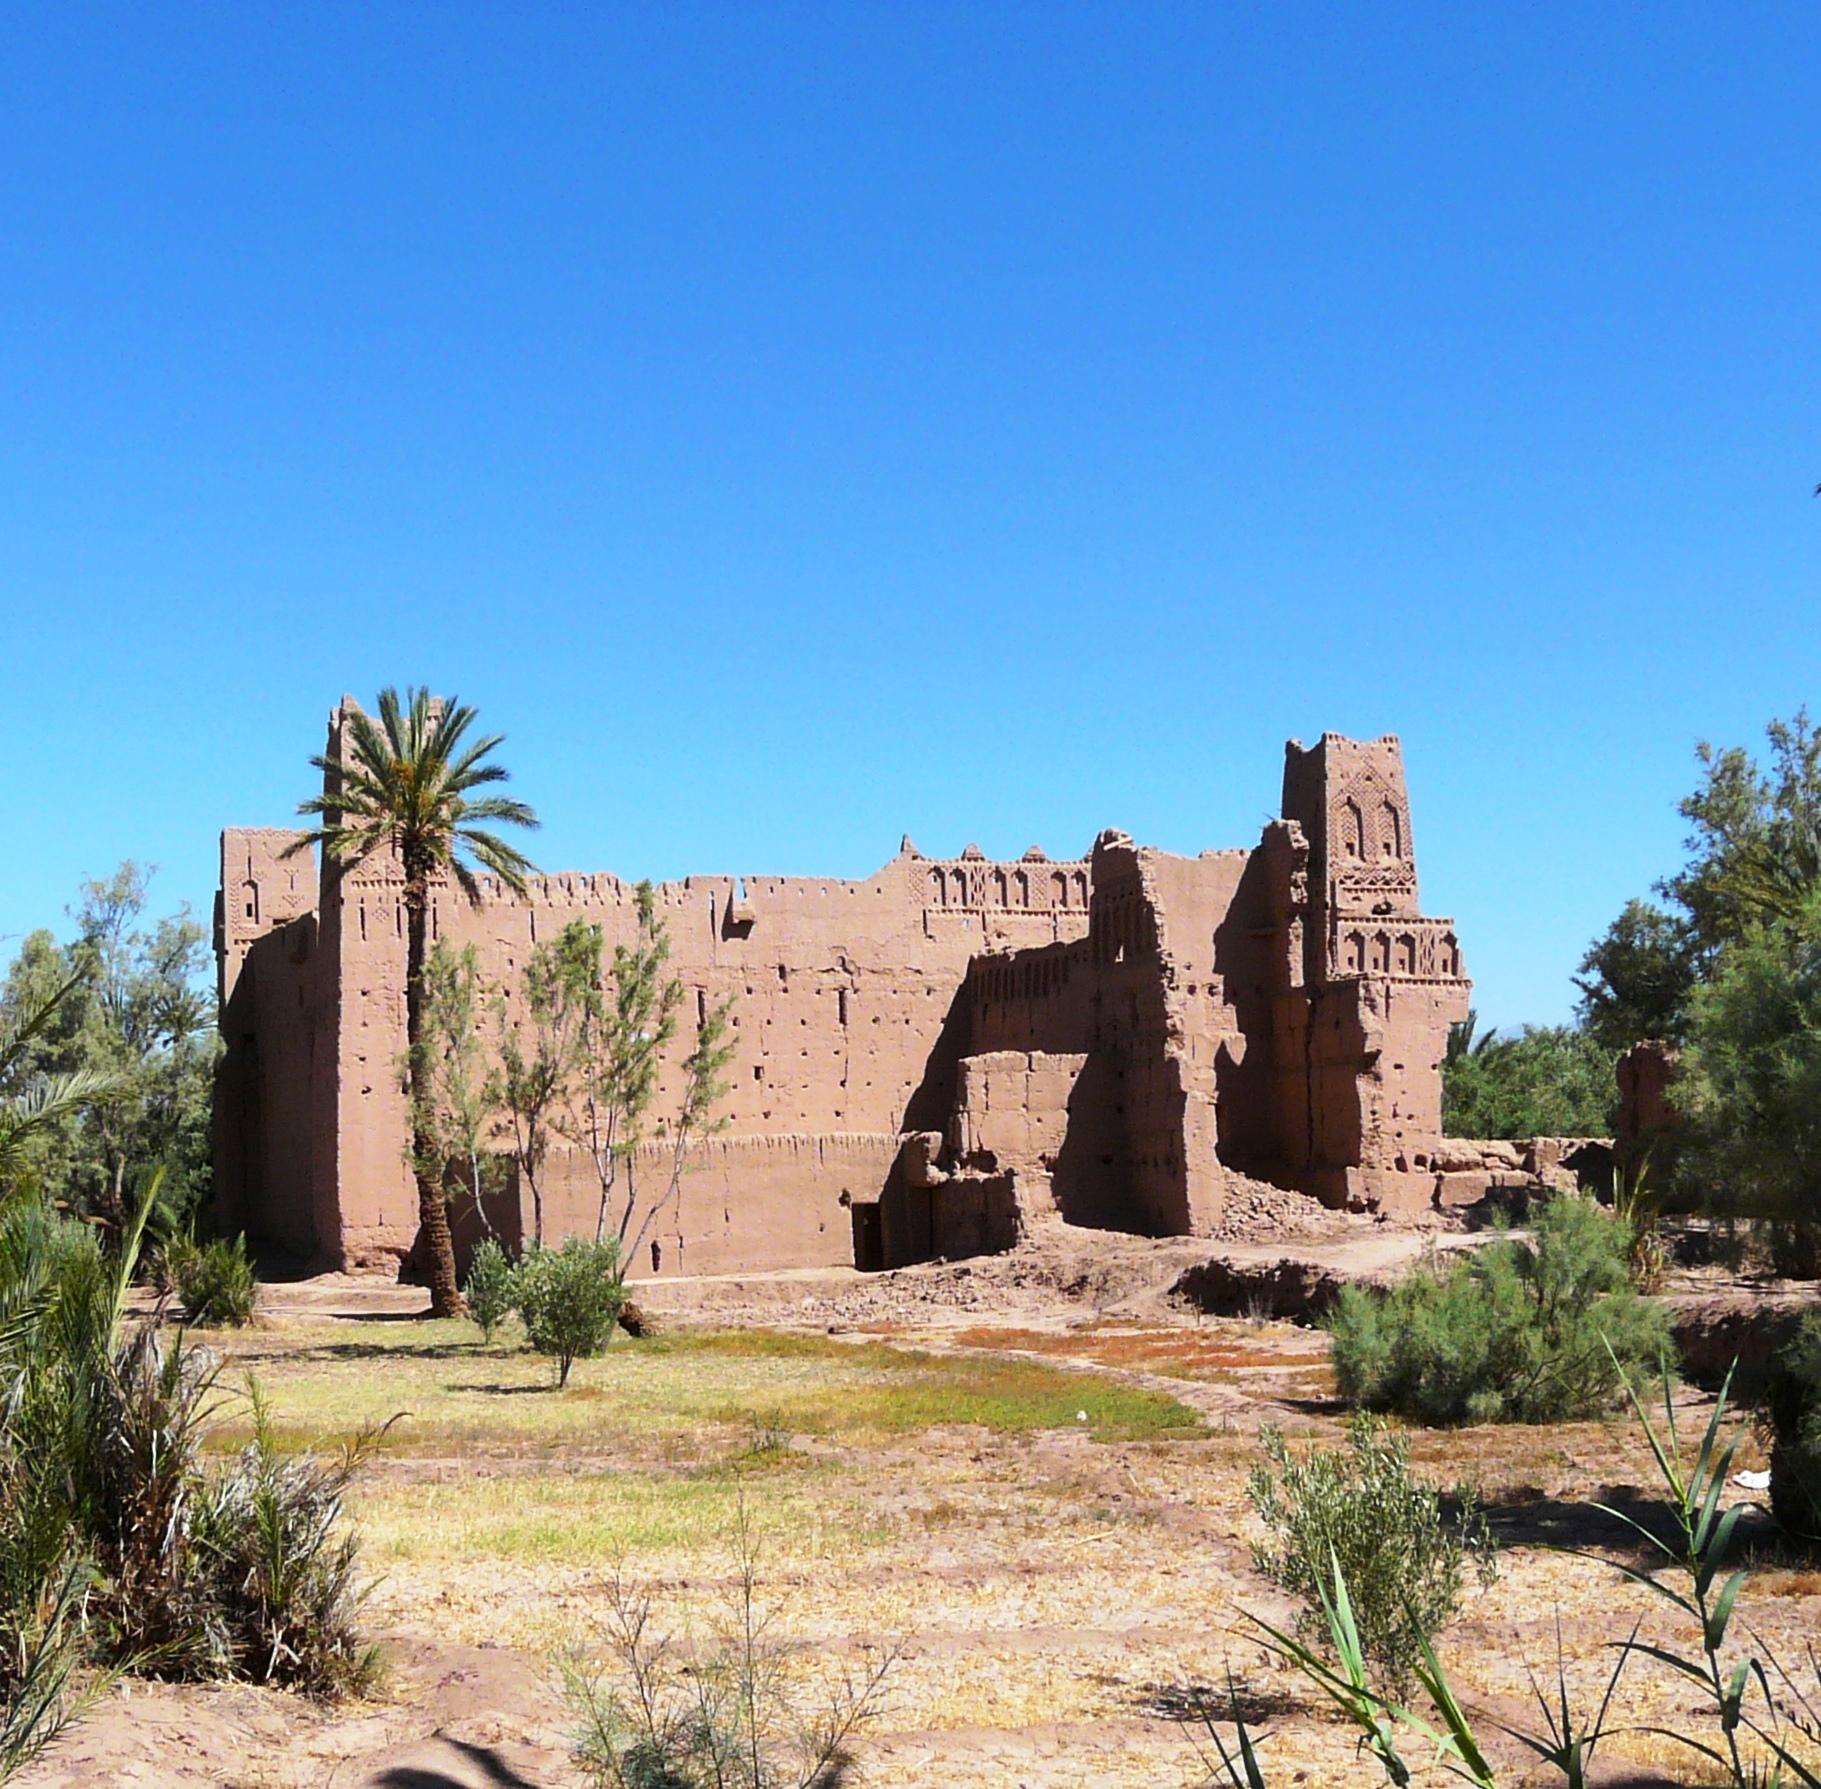 Ouarzazate-ksar-marruecos